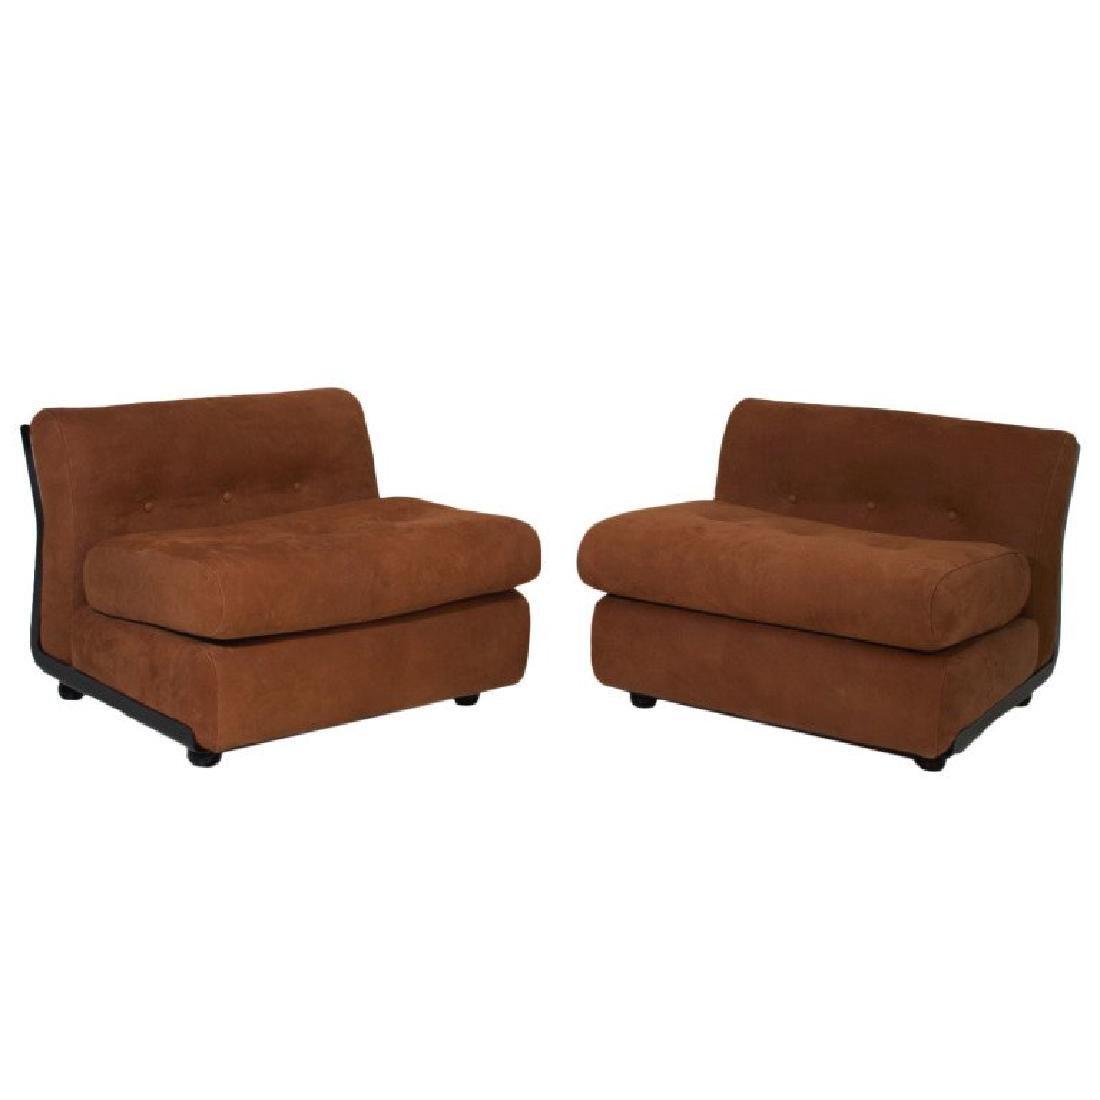 Mario Bellini Amanta Chairs (2)